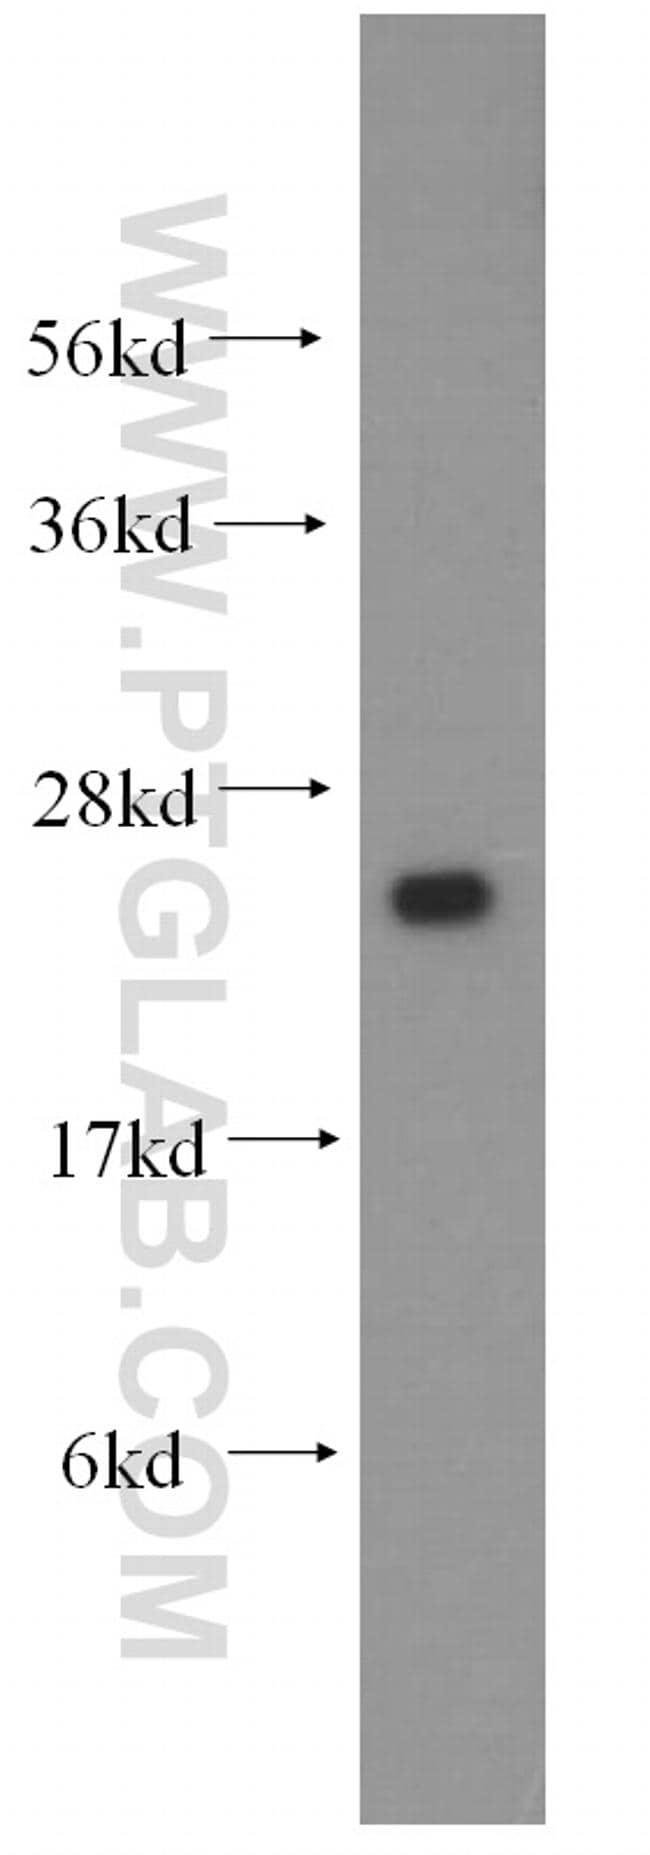 IFT25 Antibody in Western Blot (WB)